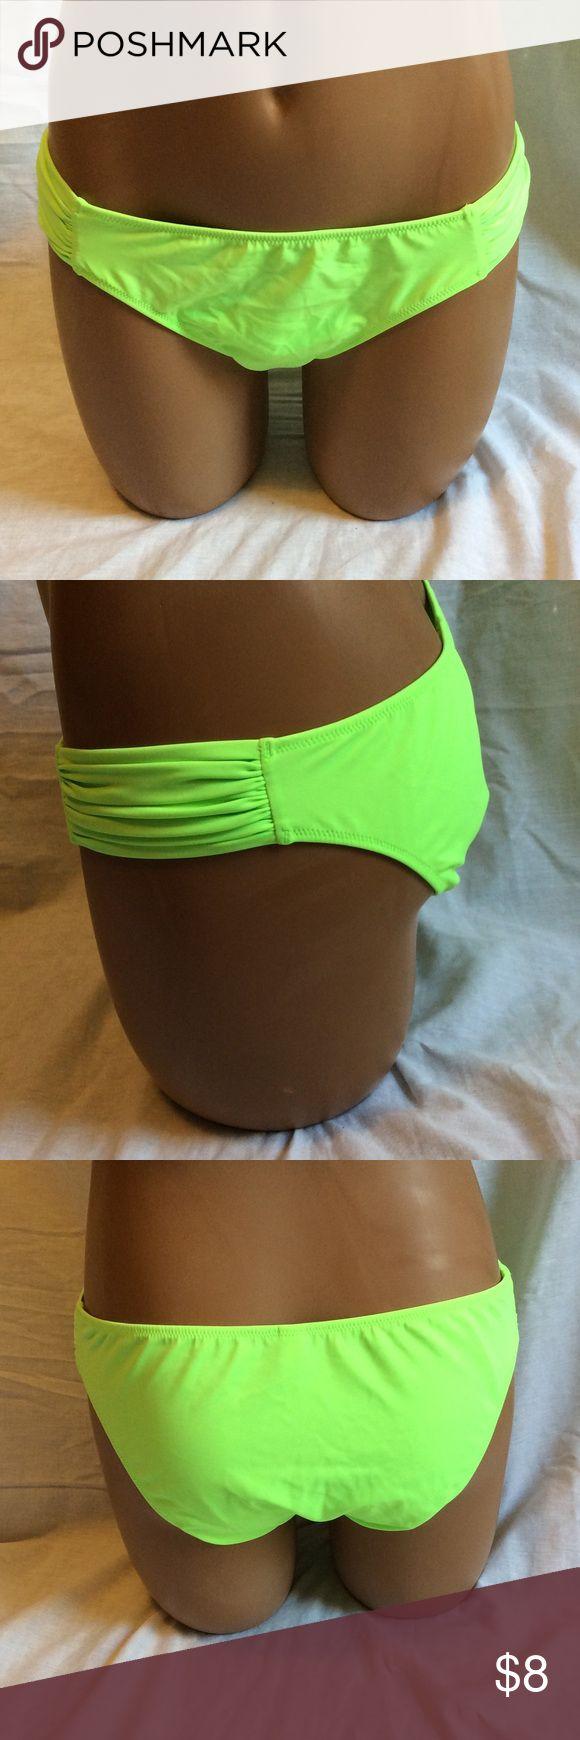 Victoria's Secret Green Bikini Bottoms Super cute, great condition! 80% nylon. 20% elastane. Victoria's Secret Swim Bikinis